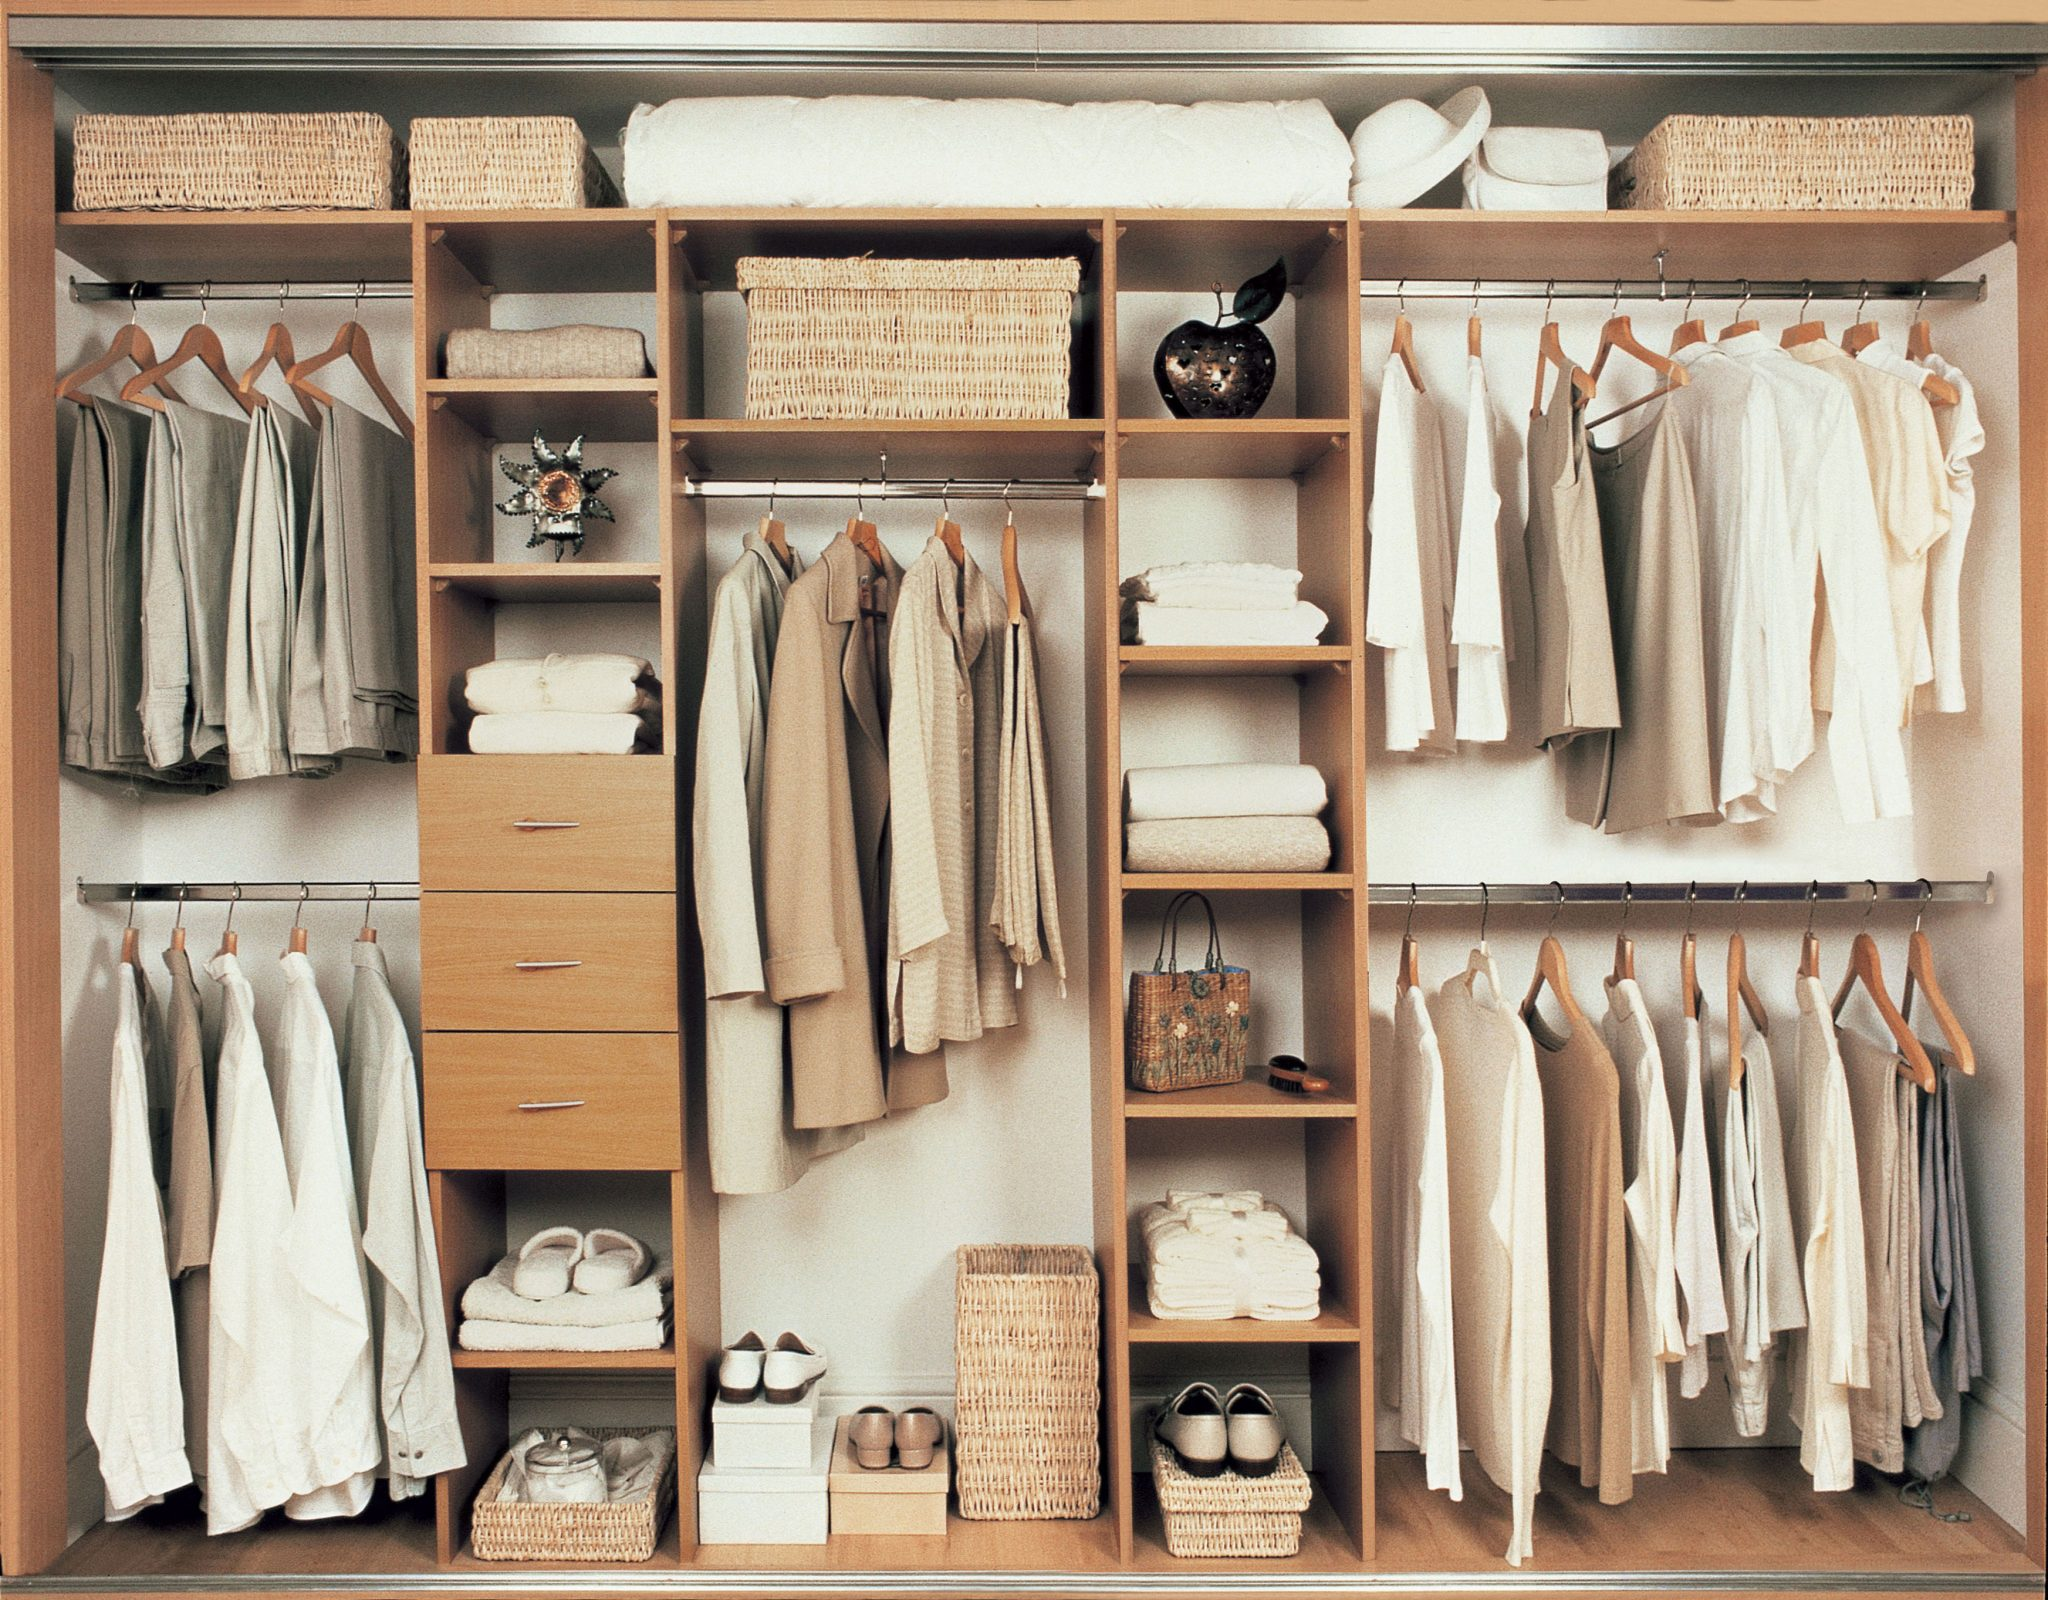 Wardrobe - adjustable shelving - pole interior